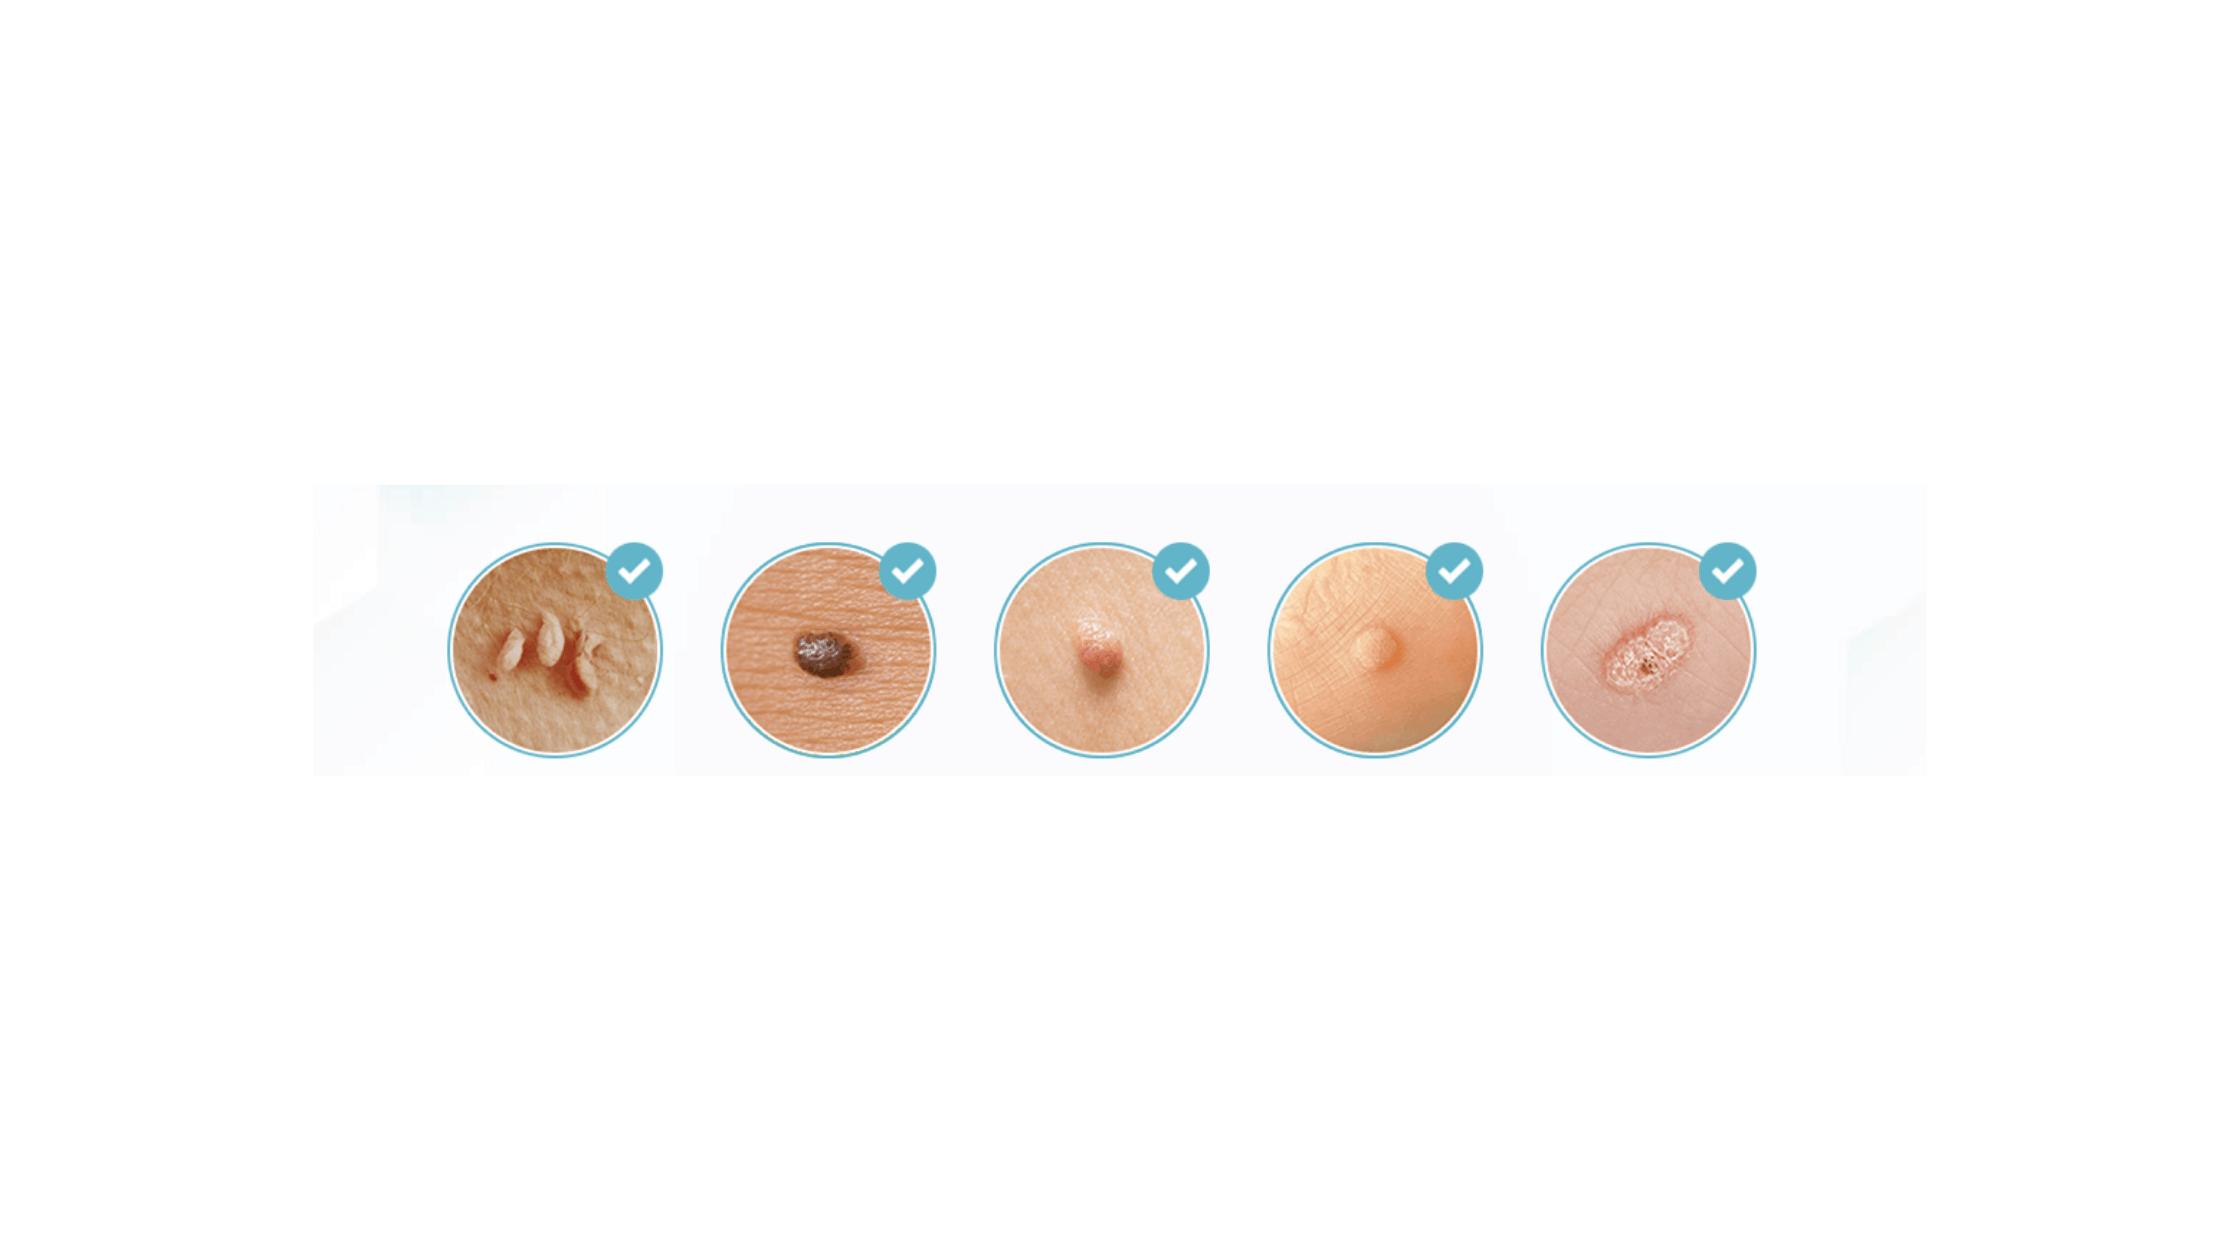 Dermicell mole & skin tag corrector serum